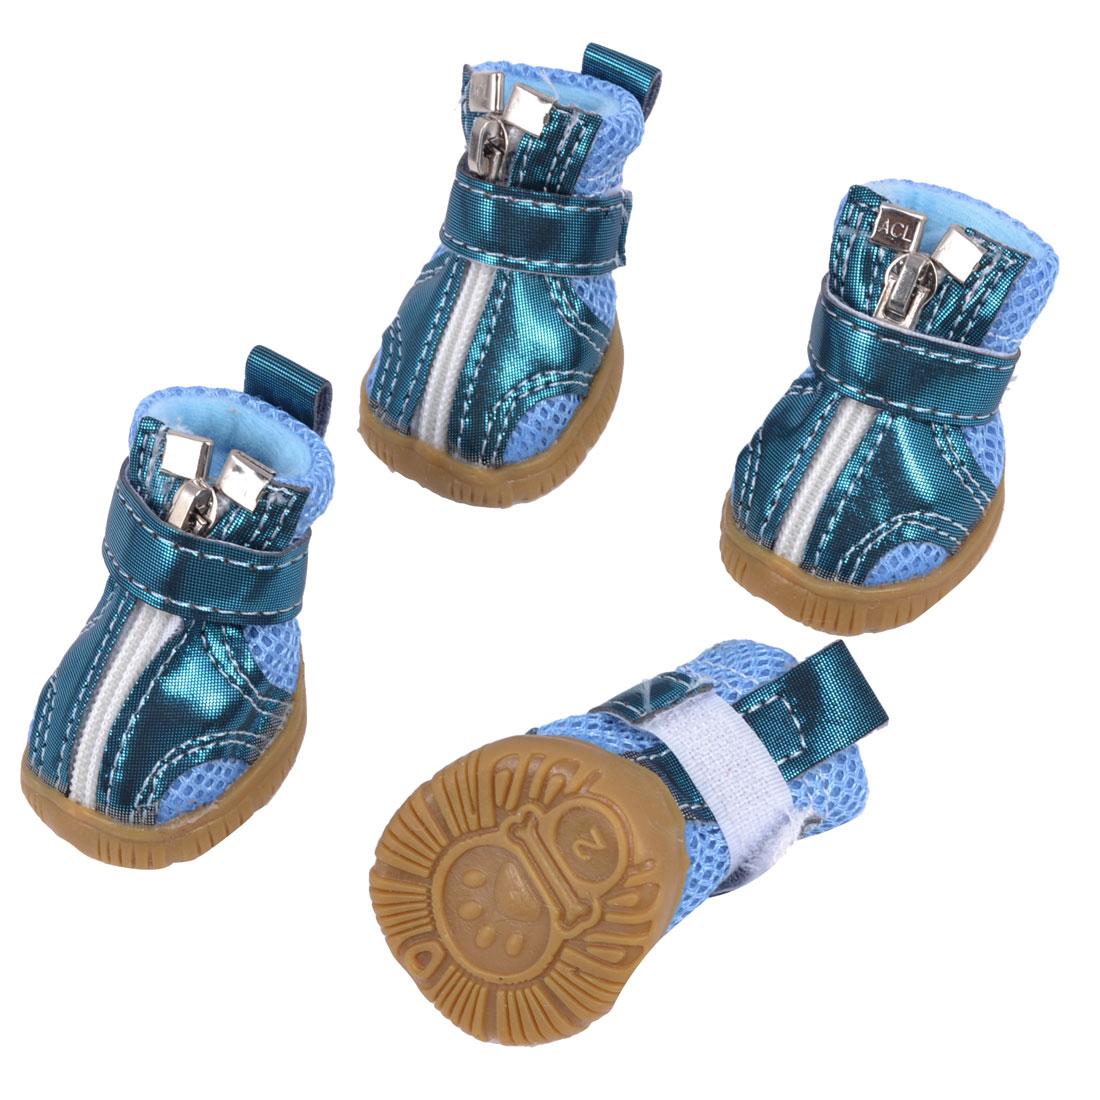 Pet Dog Cat Hook Loop Fastener Zip Closure Mesh Style Paw Pattern Antislip Sole Detachable Closure Shoes Blue 2 Pair XS